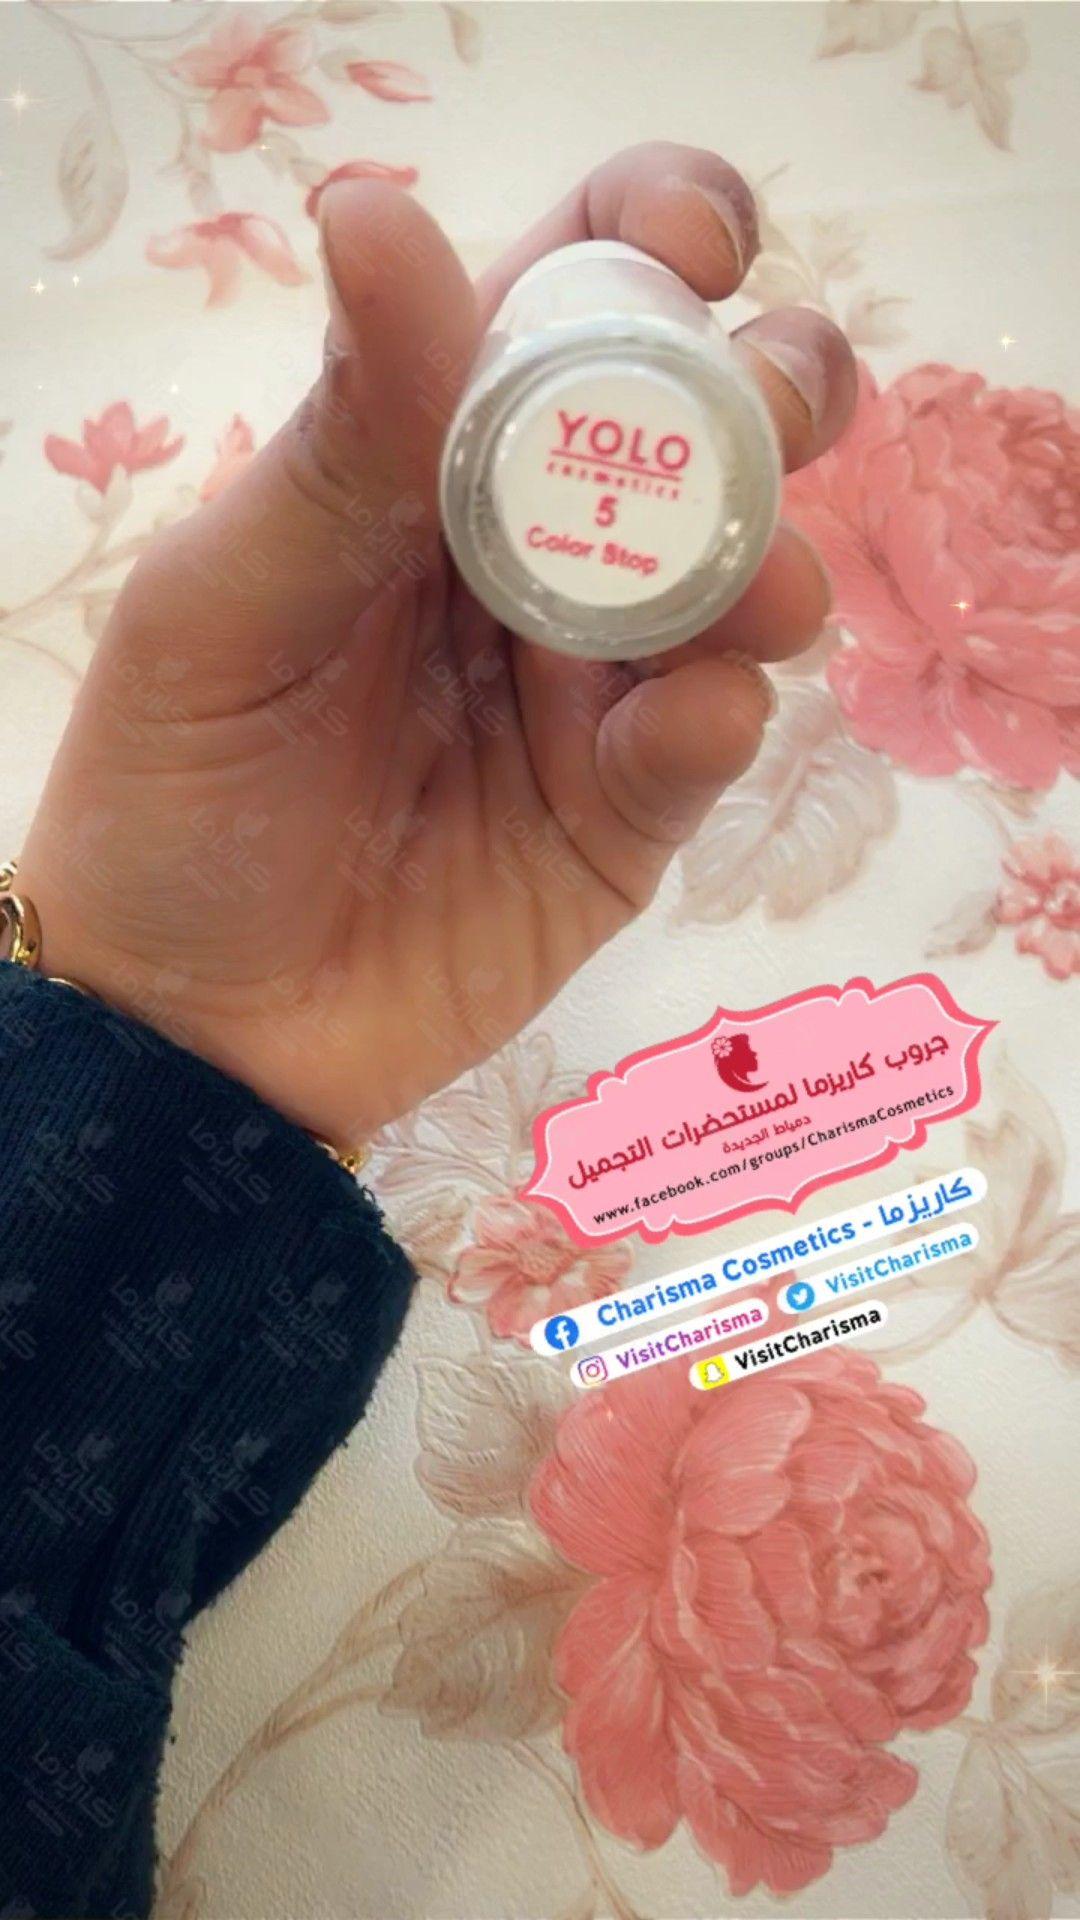 Yolo Color Stop اختراع جديد هيخليكي تعرفي تحطي مناكير براحتك وبسهولة لينك جروب كاريزما Www Face Popsockets Electronic Products Cosmetics